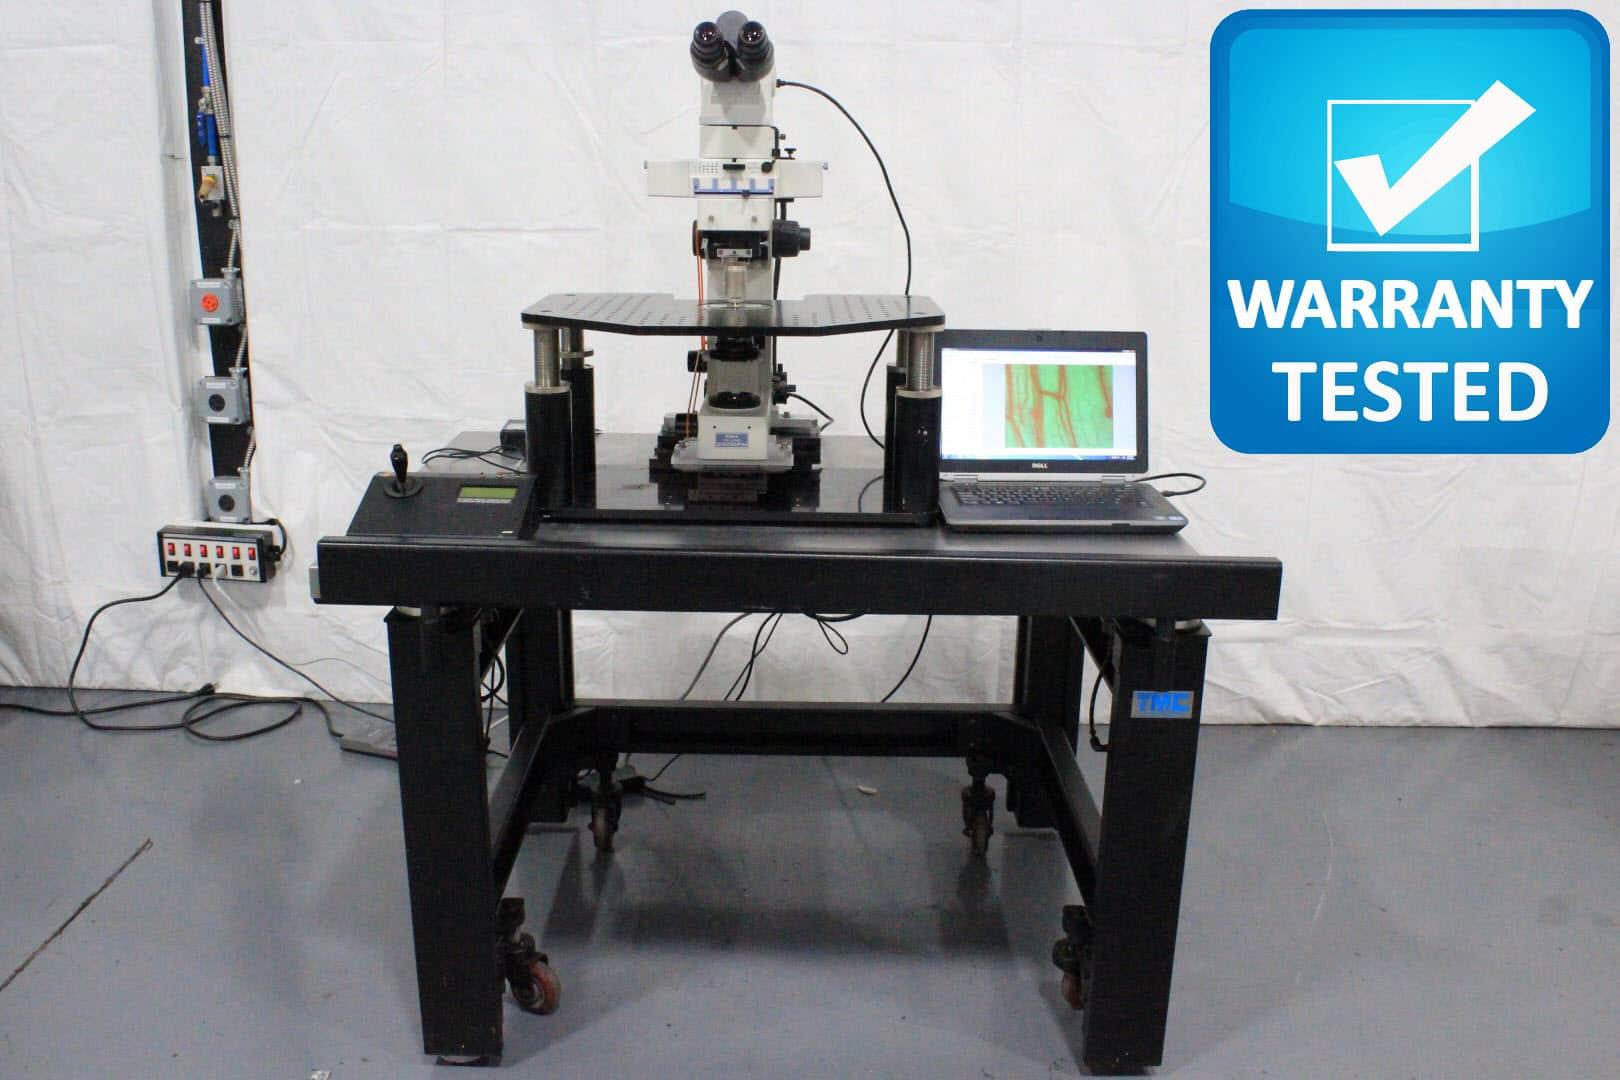 Nikon E600 FN Fluorescence Microscope E600FN w/ Anti-Vibration Table